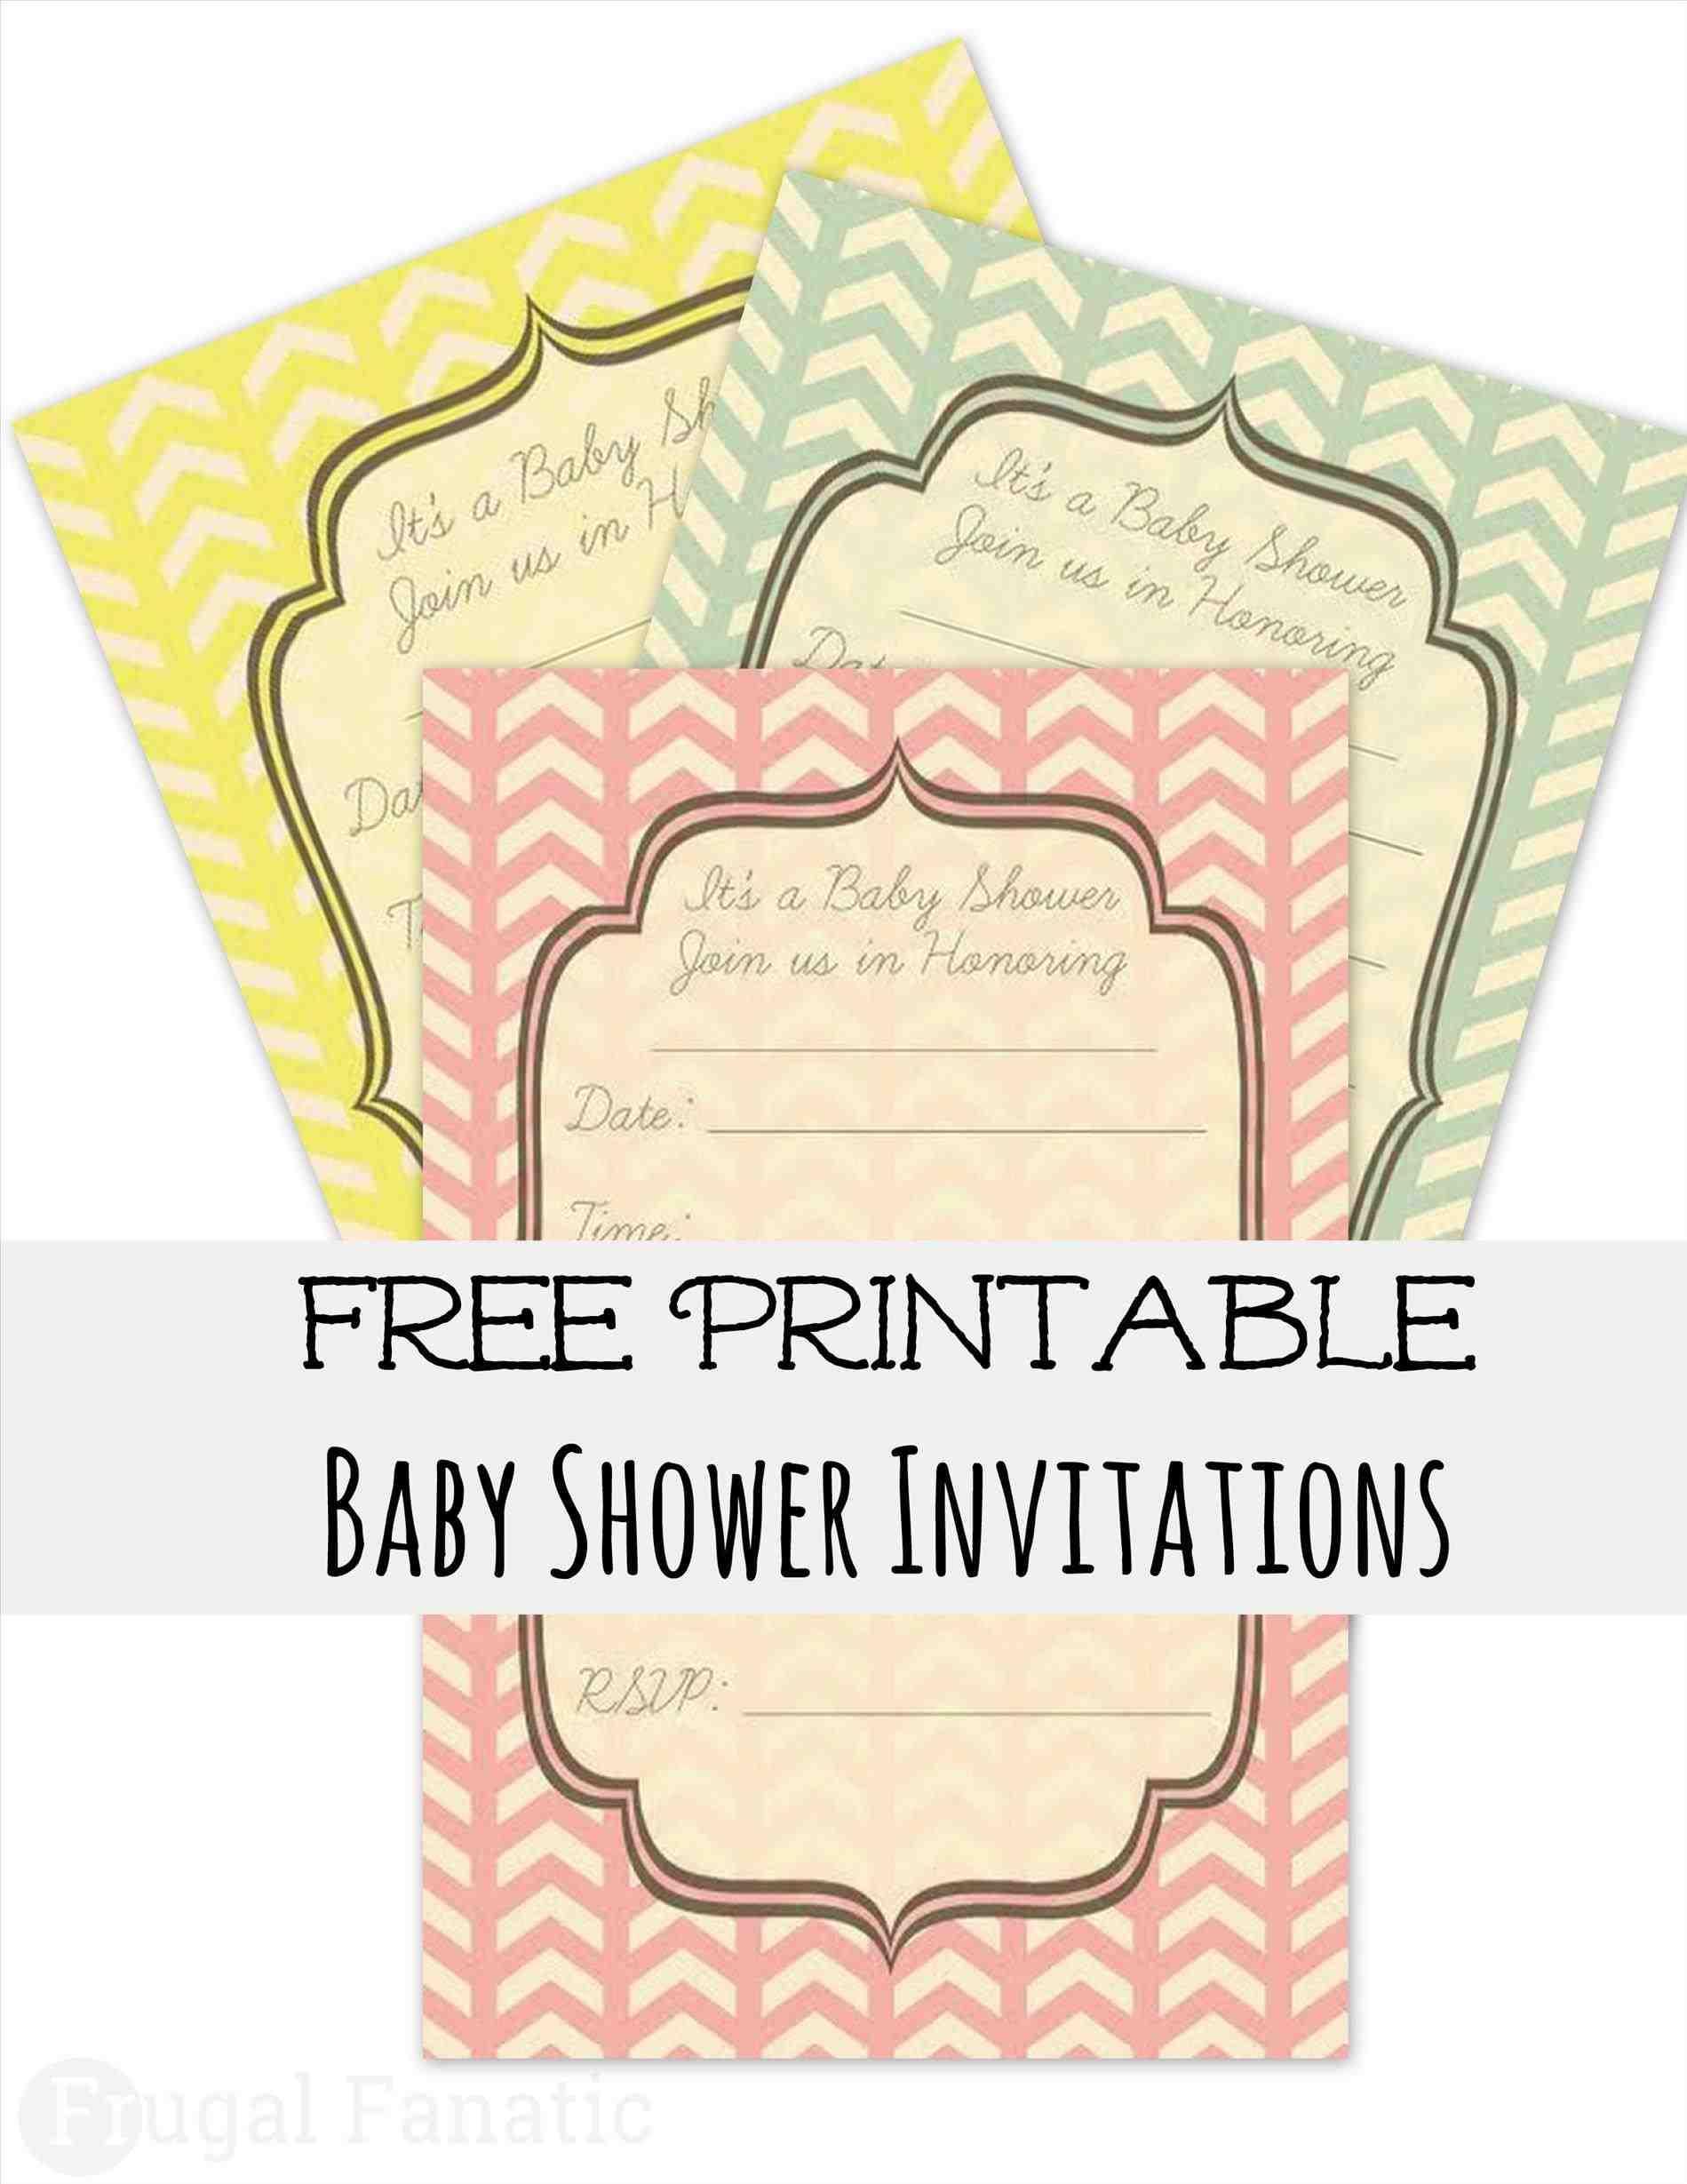 Diaper Party Invitation Template Free